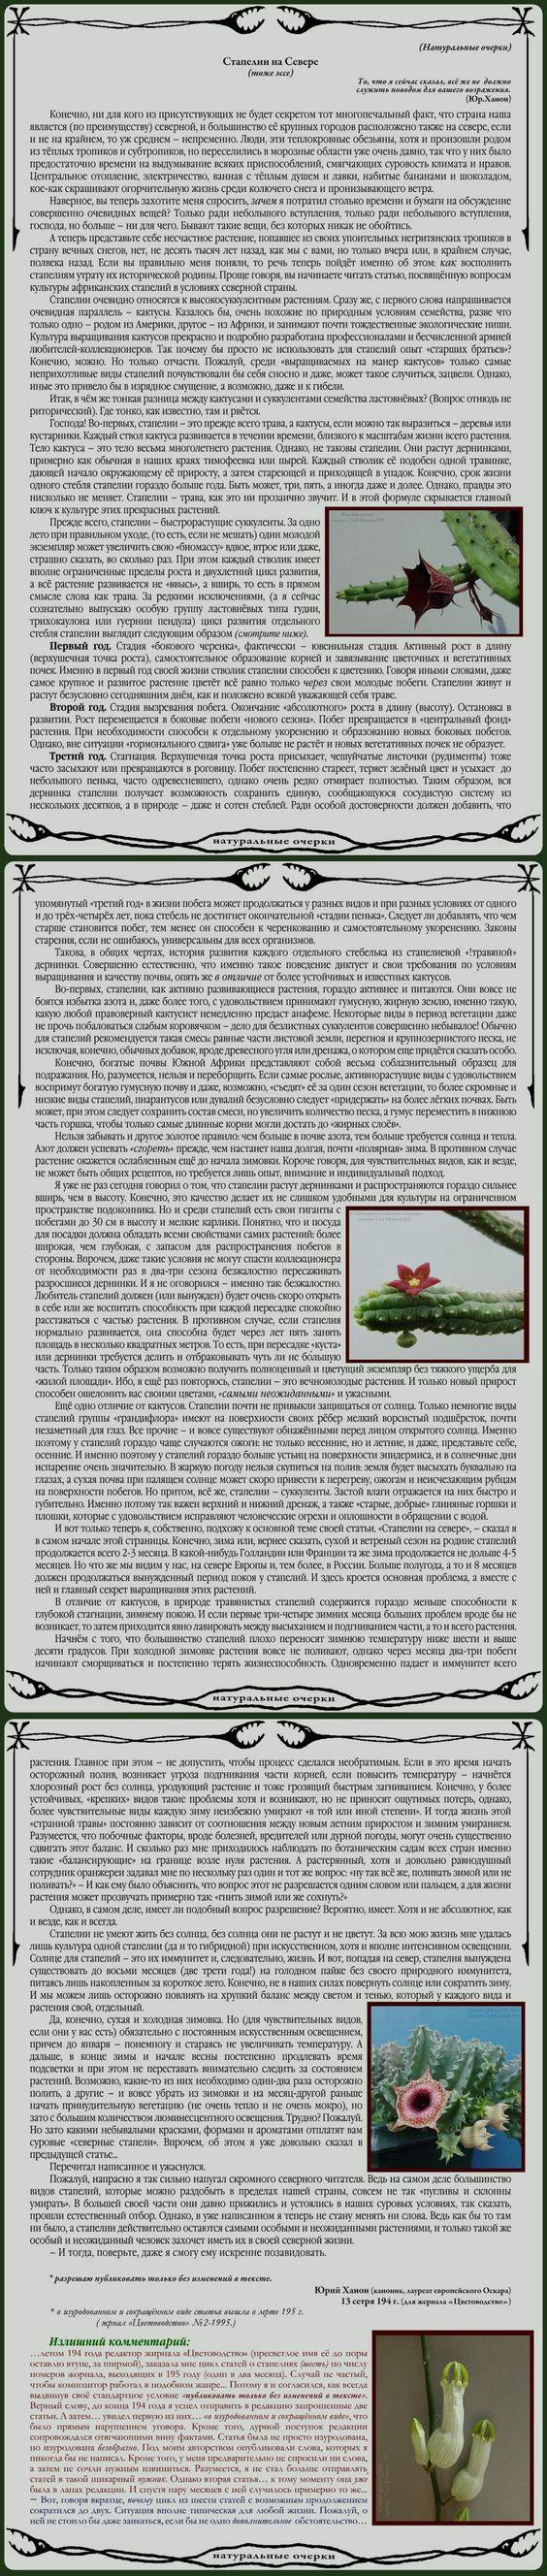 Кактусы и суккуленты 4b1564aafd9c3a9343ad19c3e36f461e